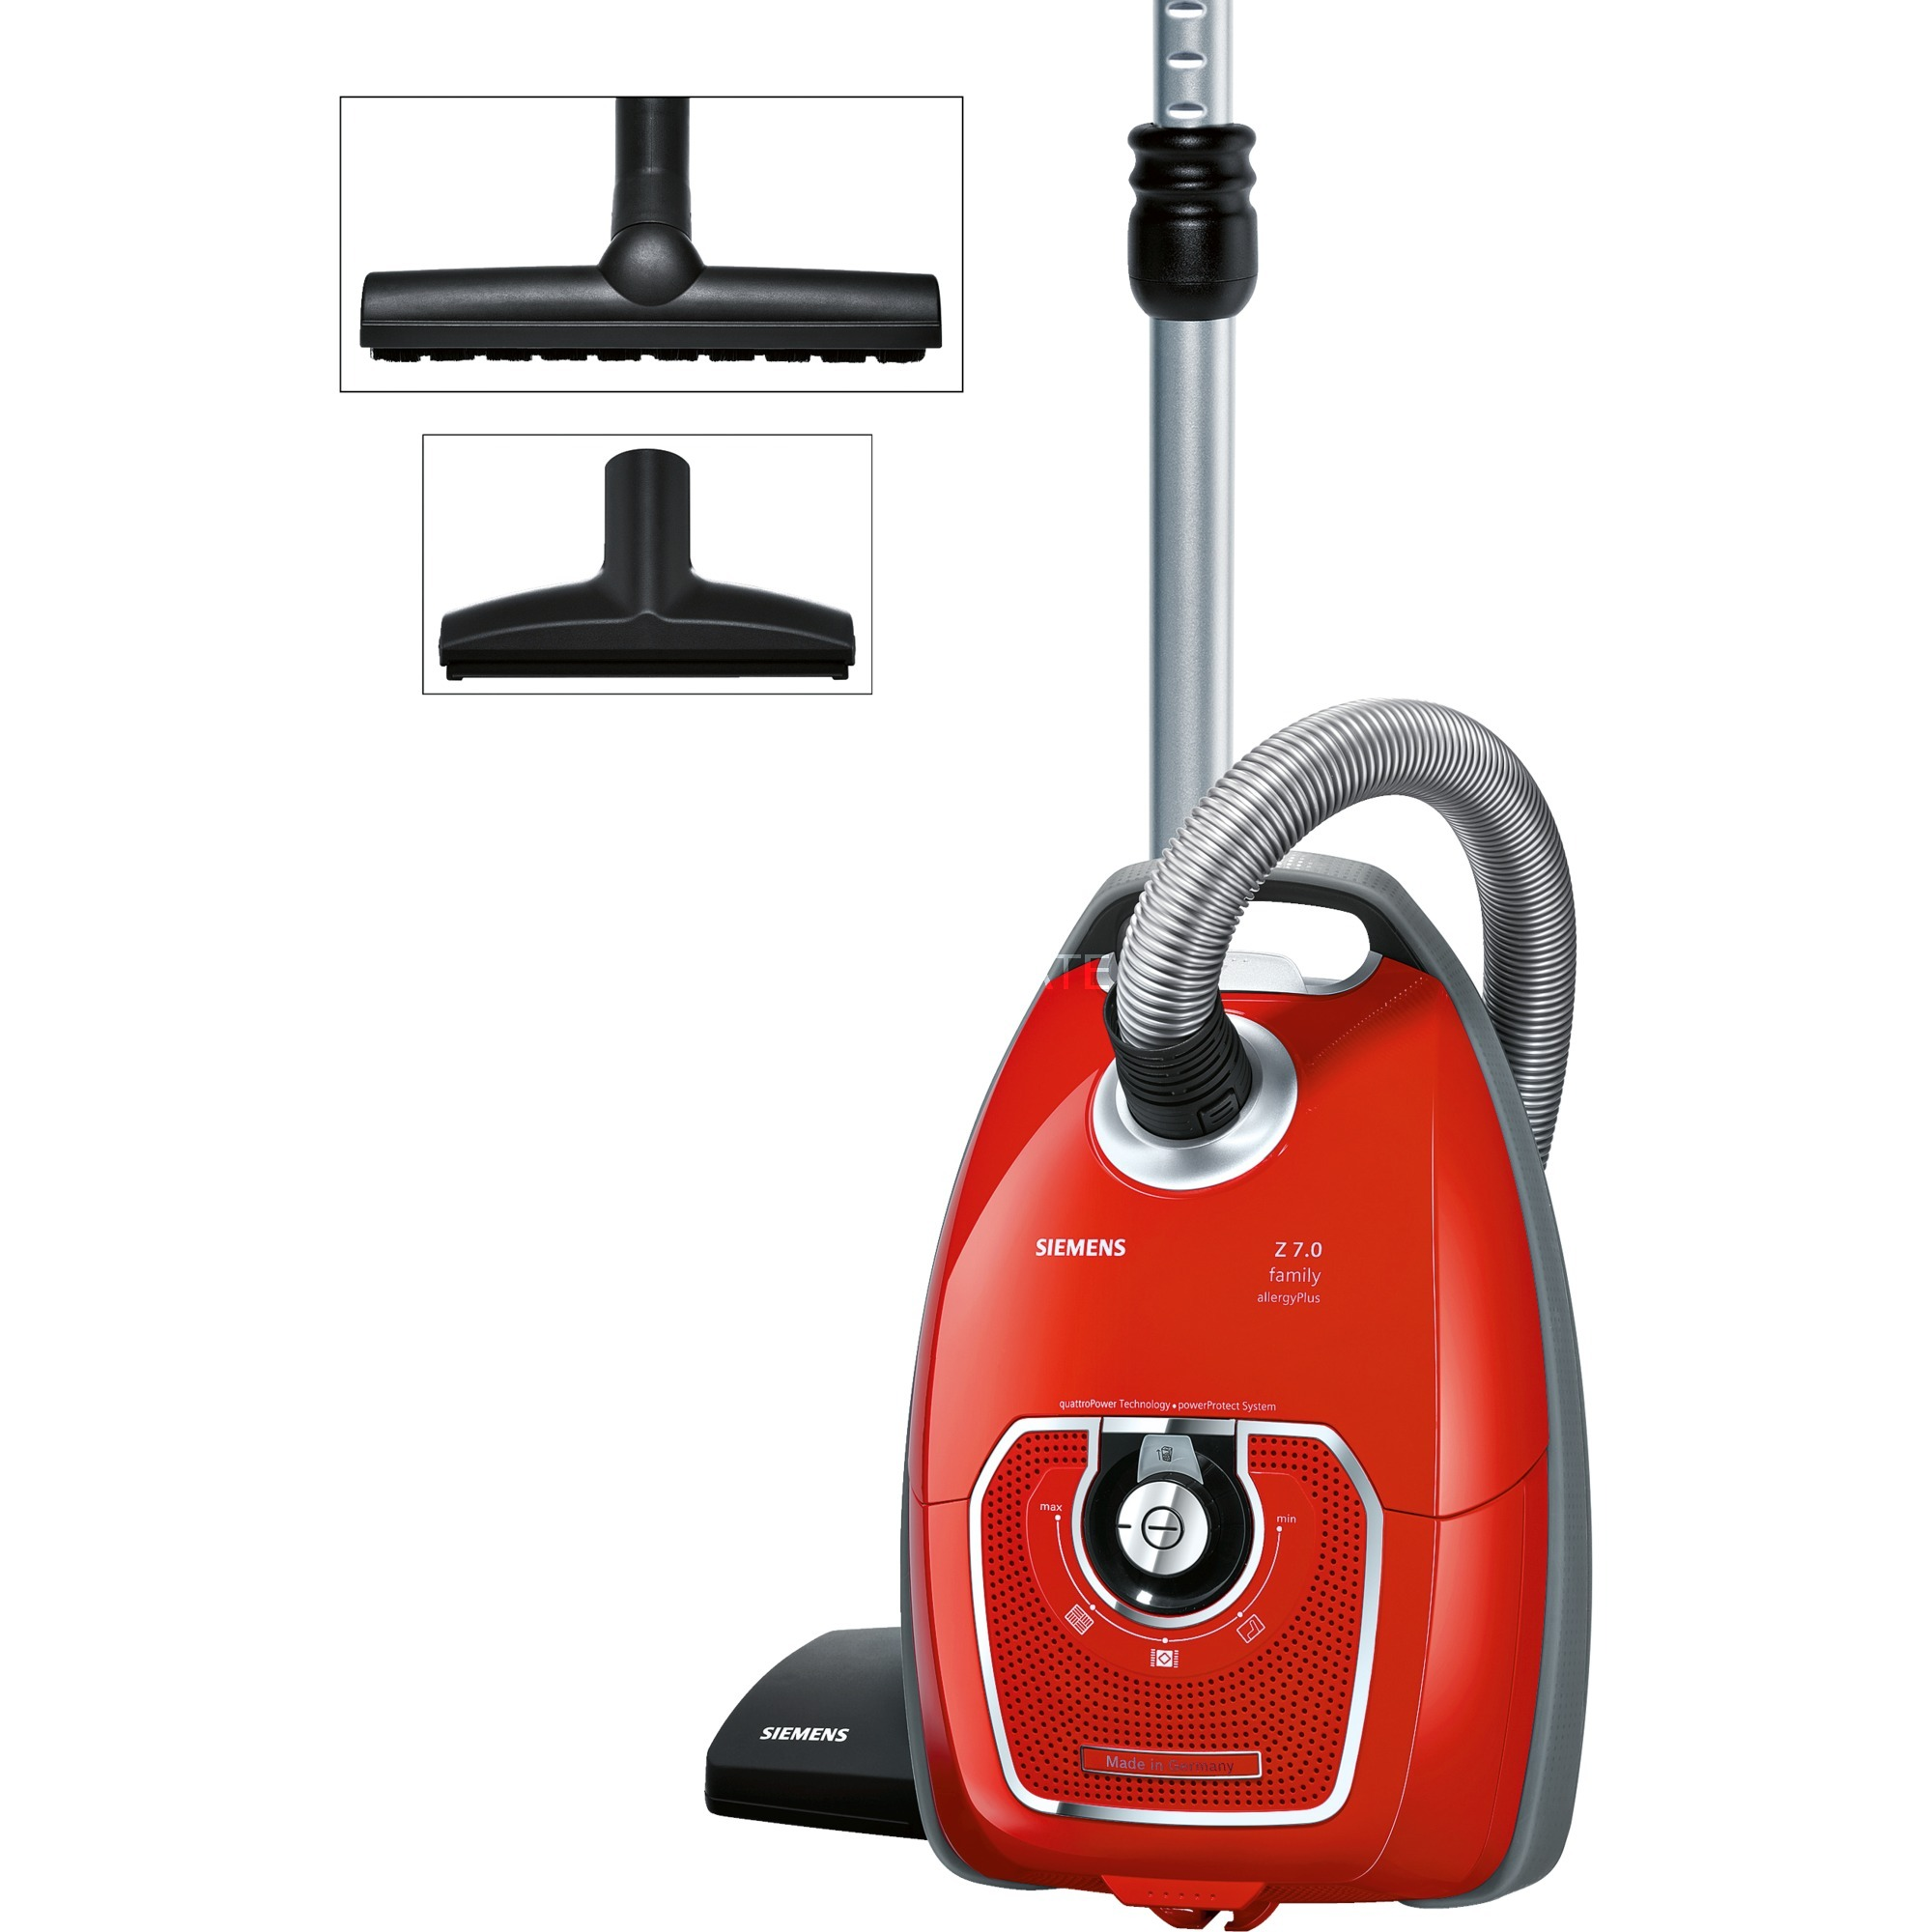 VSZ7330 Aspiradora cilíndrica 5L 650W A Negro, Rojo aspiradora, Aspiradora de suelo